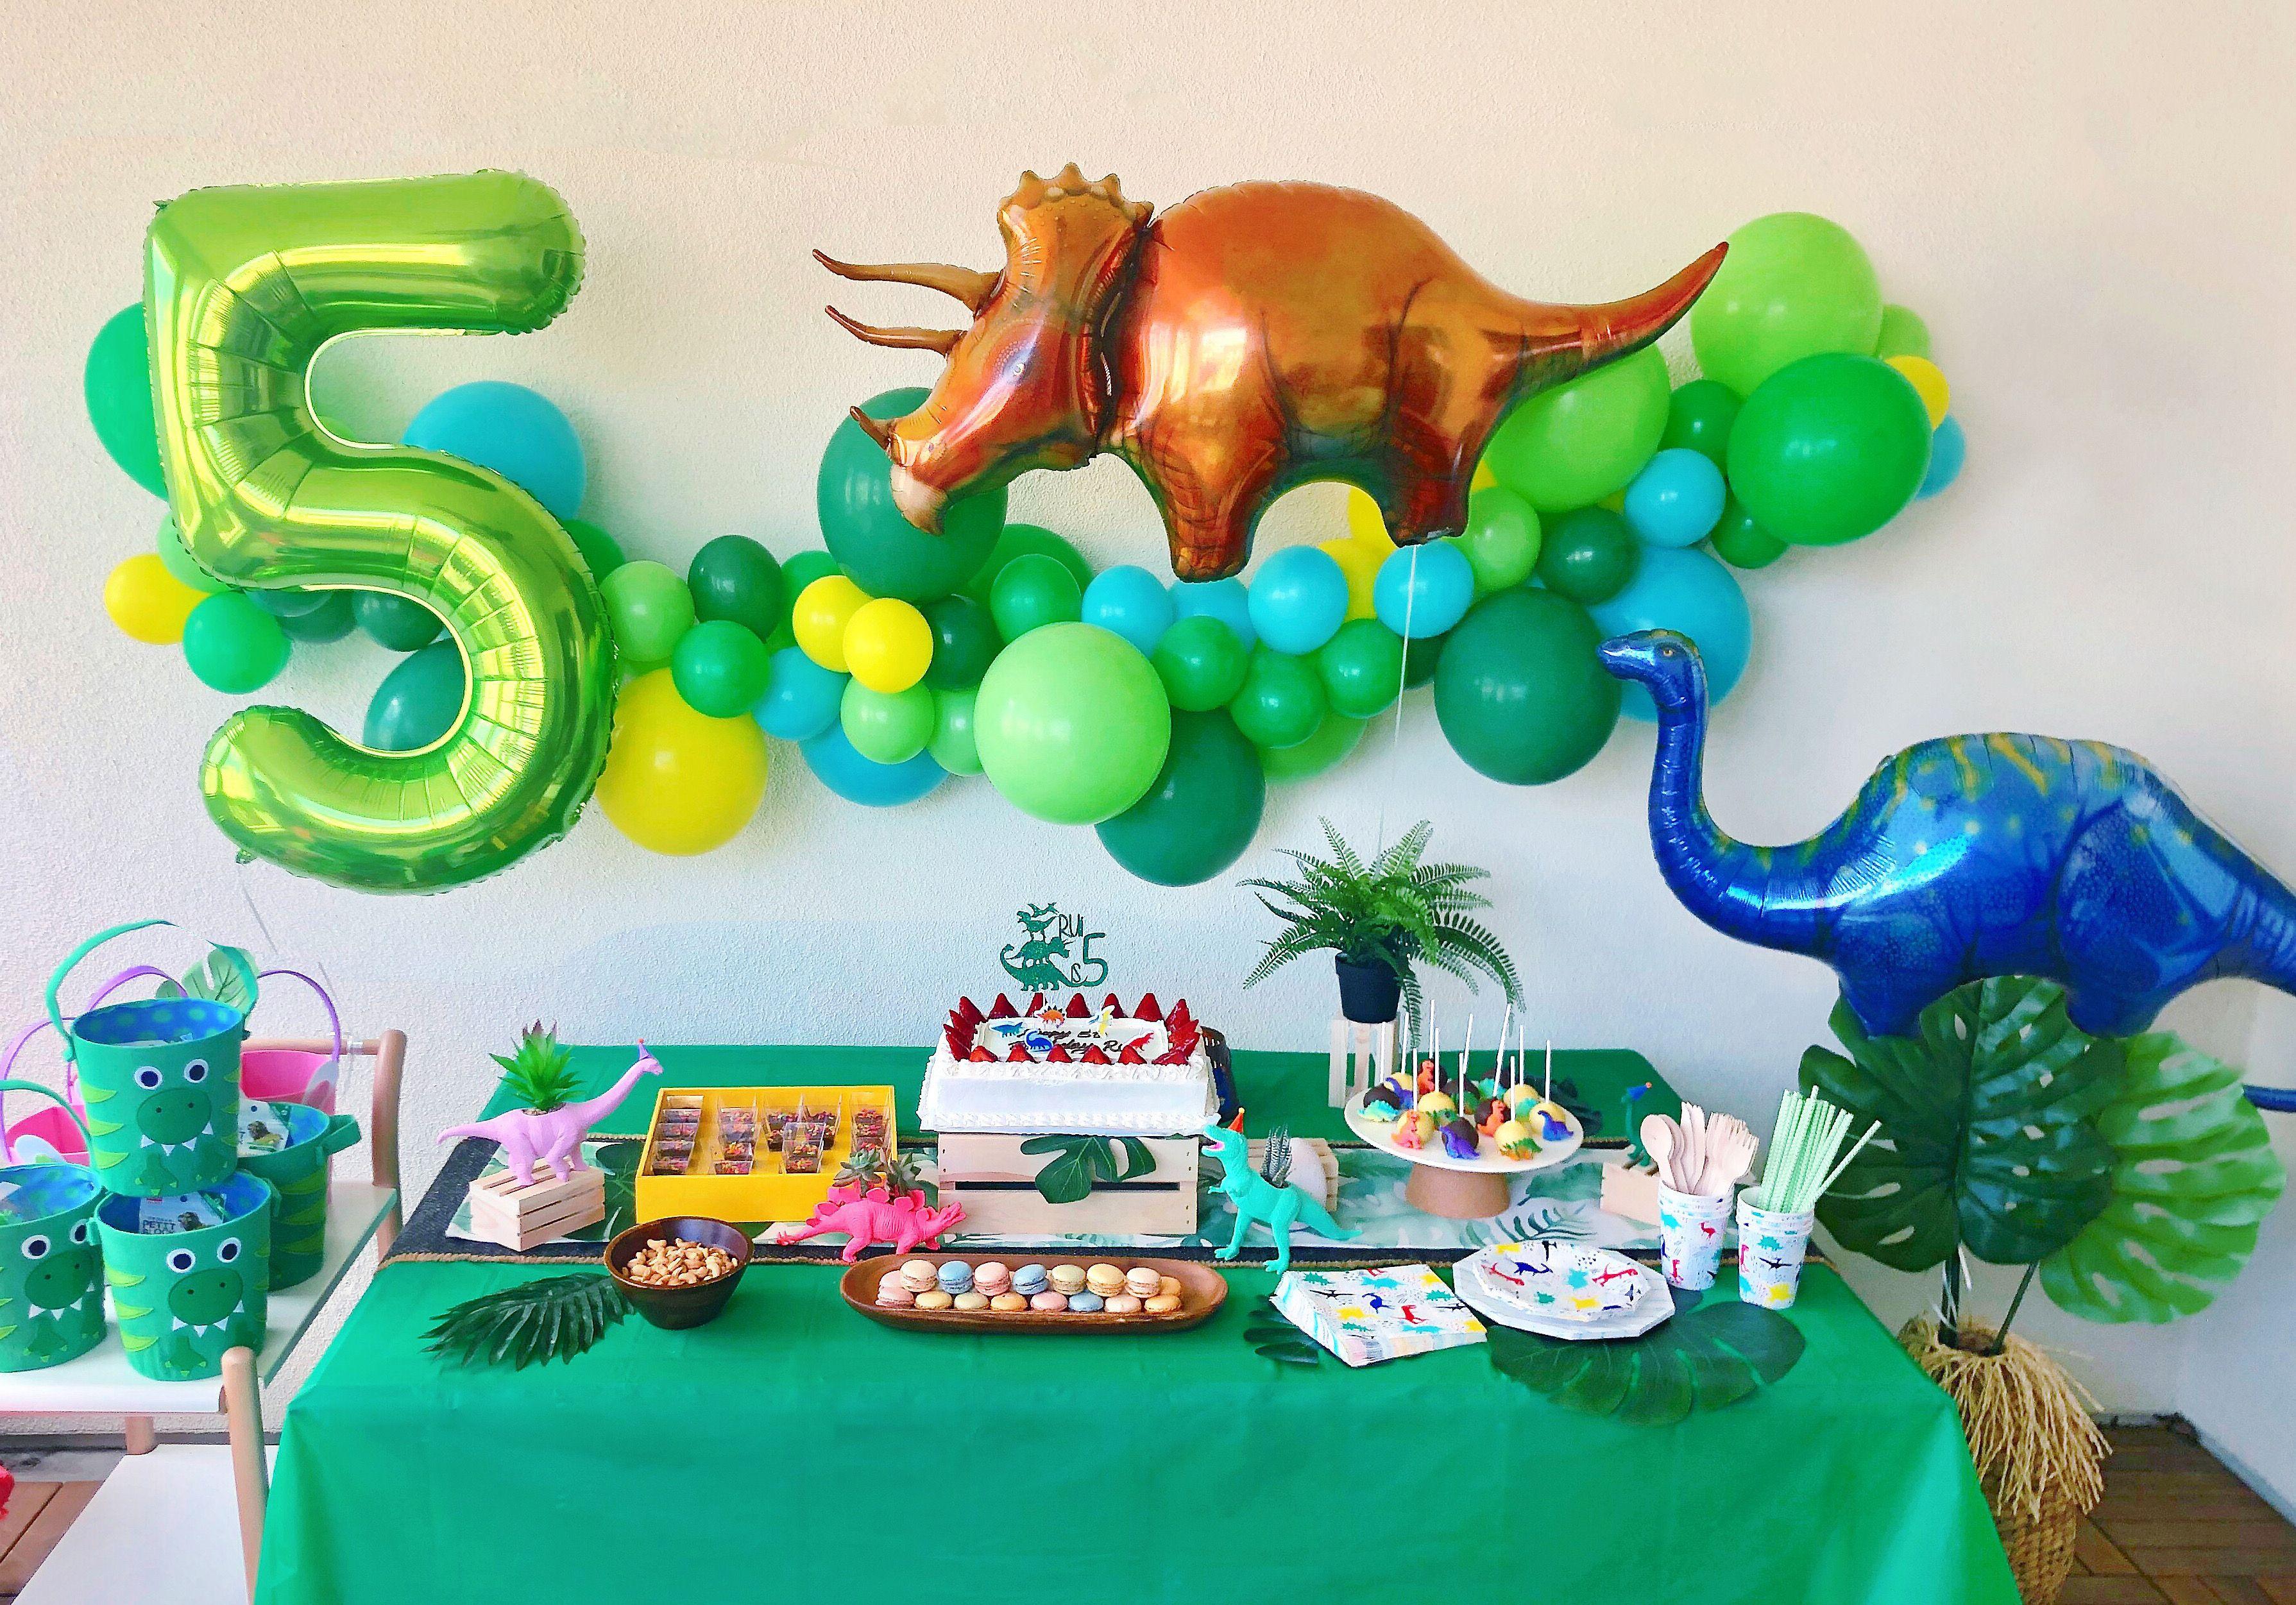 dinosaur decorations Dinosaur party Dinosaur party decorations Dinosaur baby shower Dinosaur confetti Dinosaur theme Dinosaur birthday